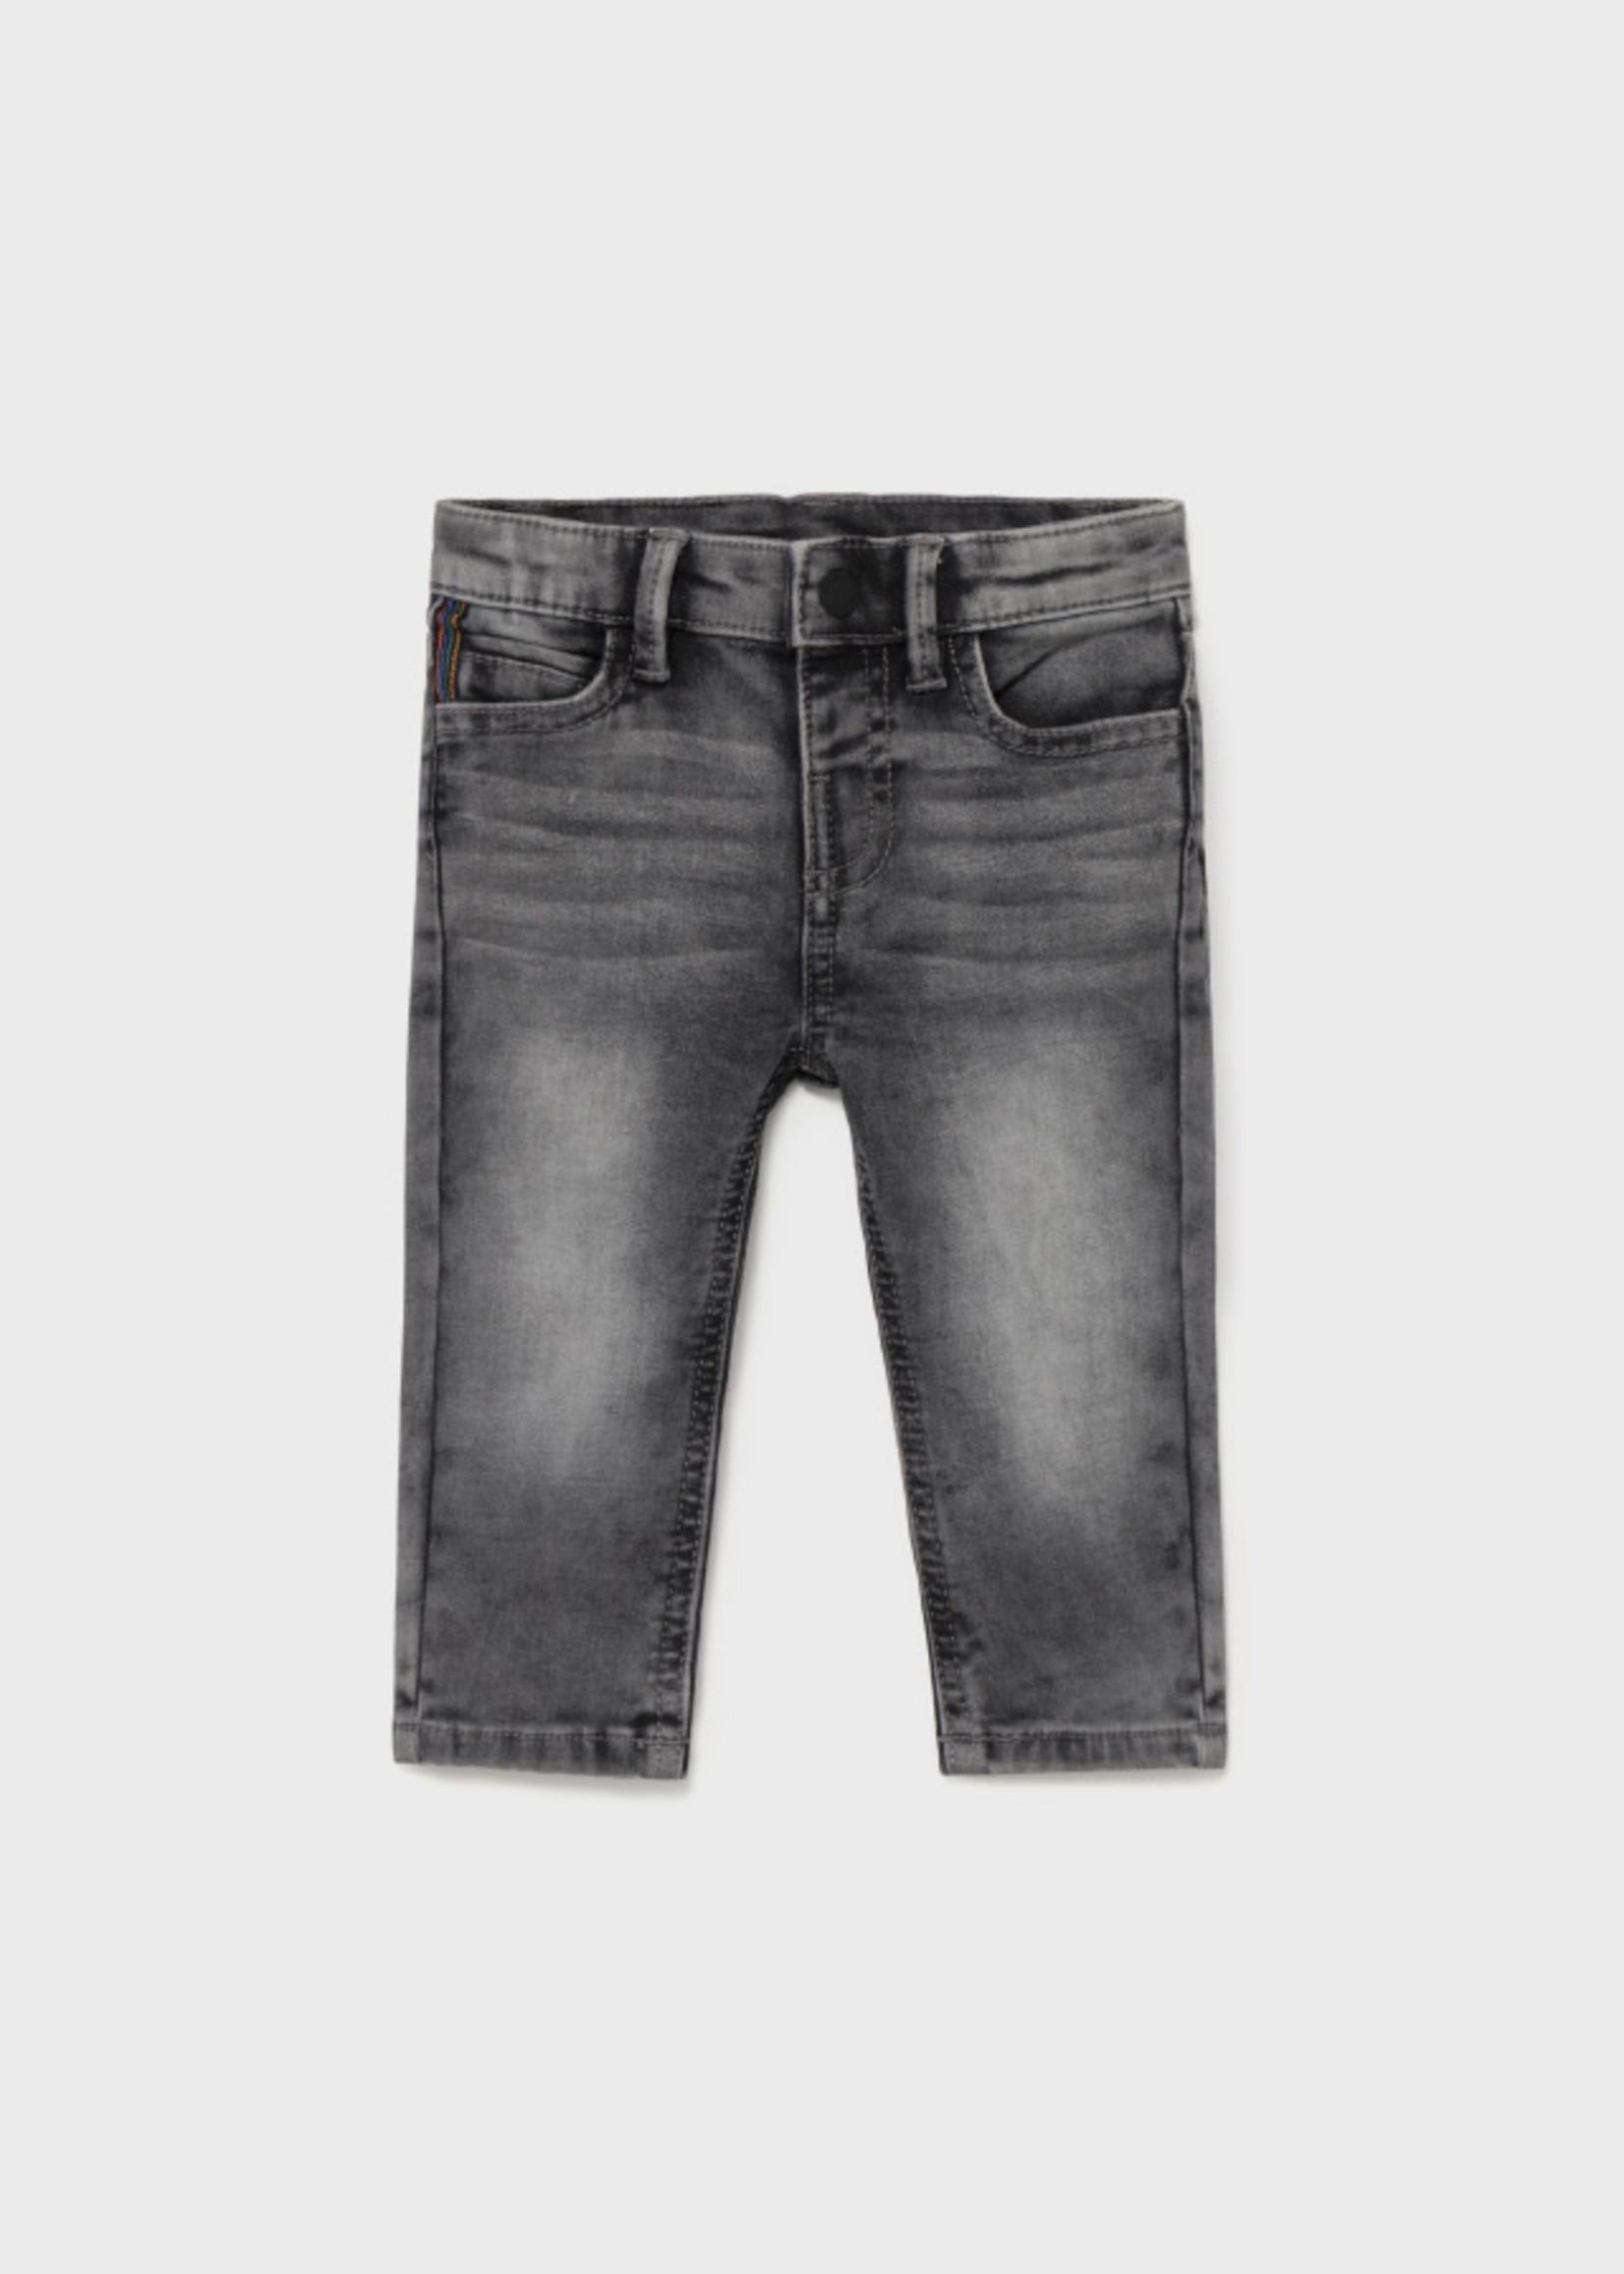 Mayoral Mayoral soft denim pants gray